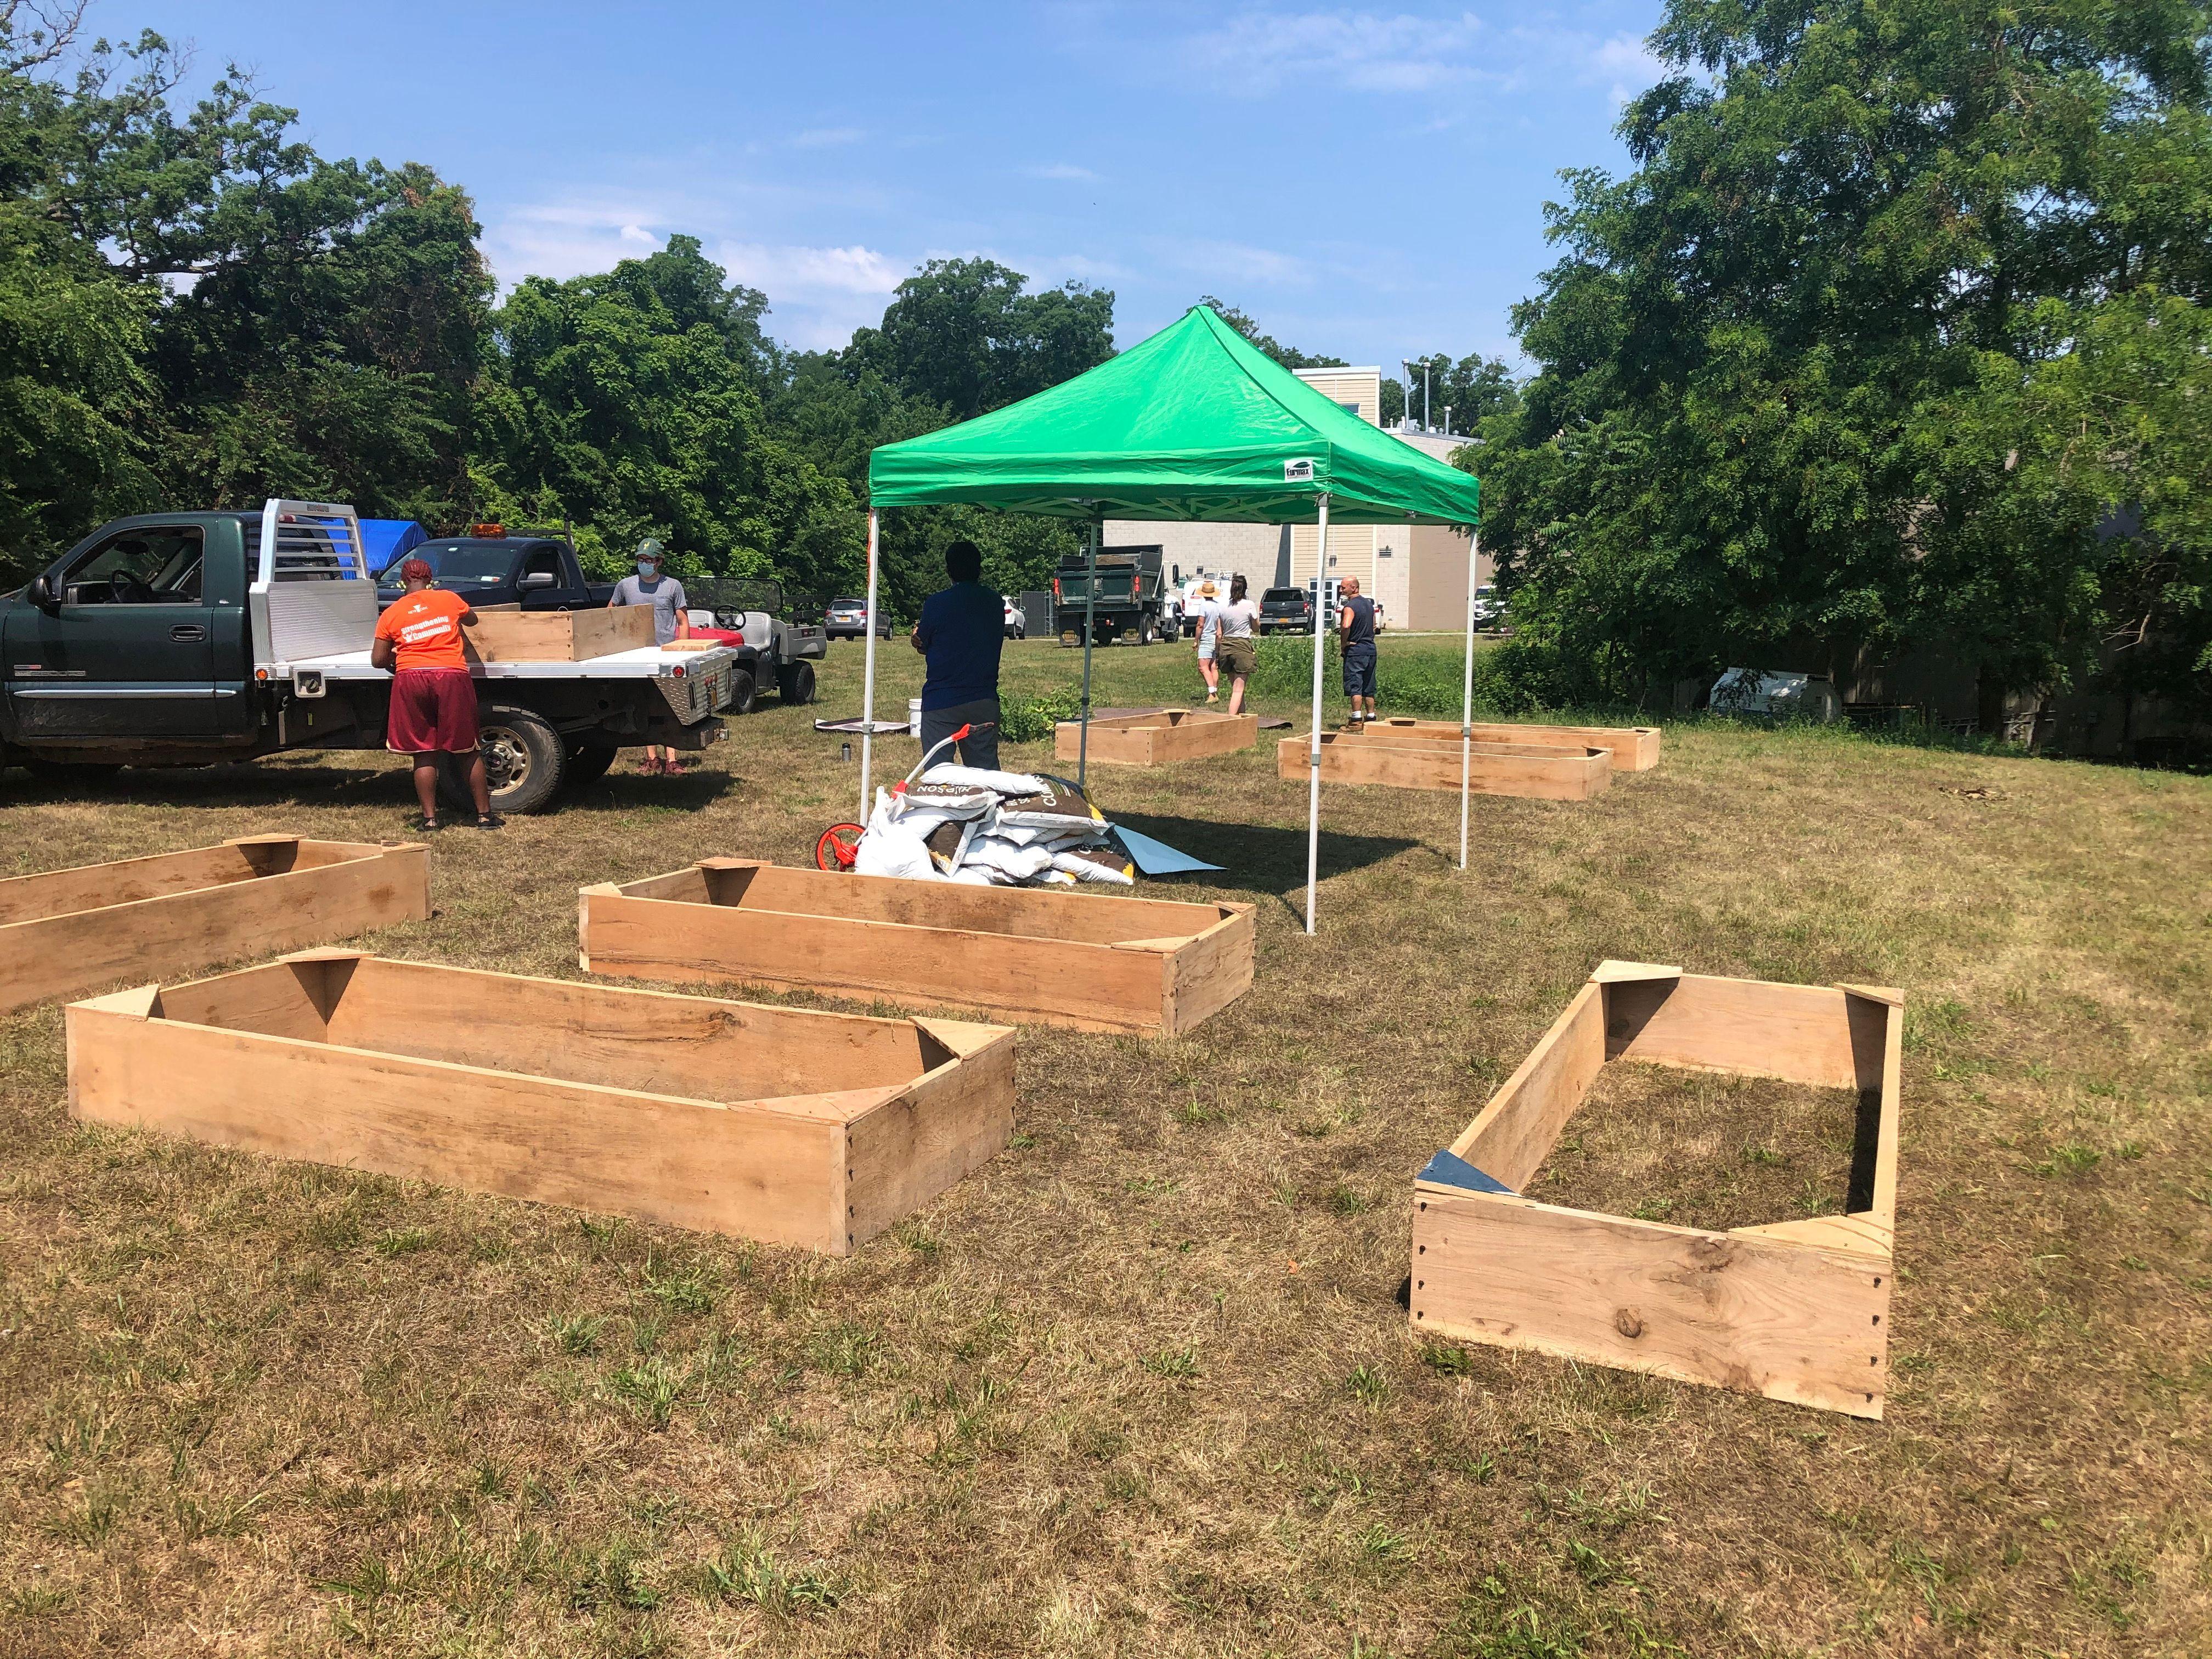 Q Gardens, Glynwood's Newest Food Sovereignty Partnership